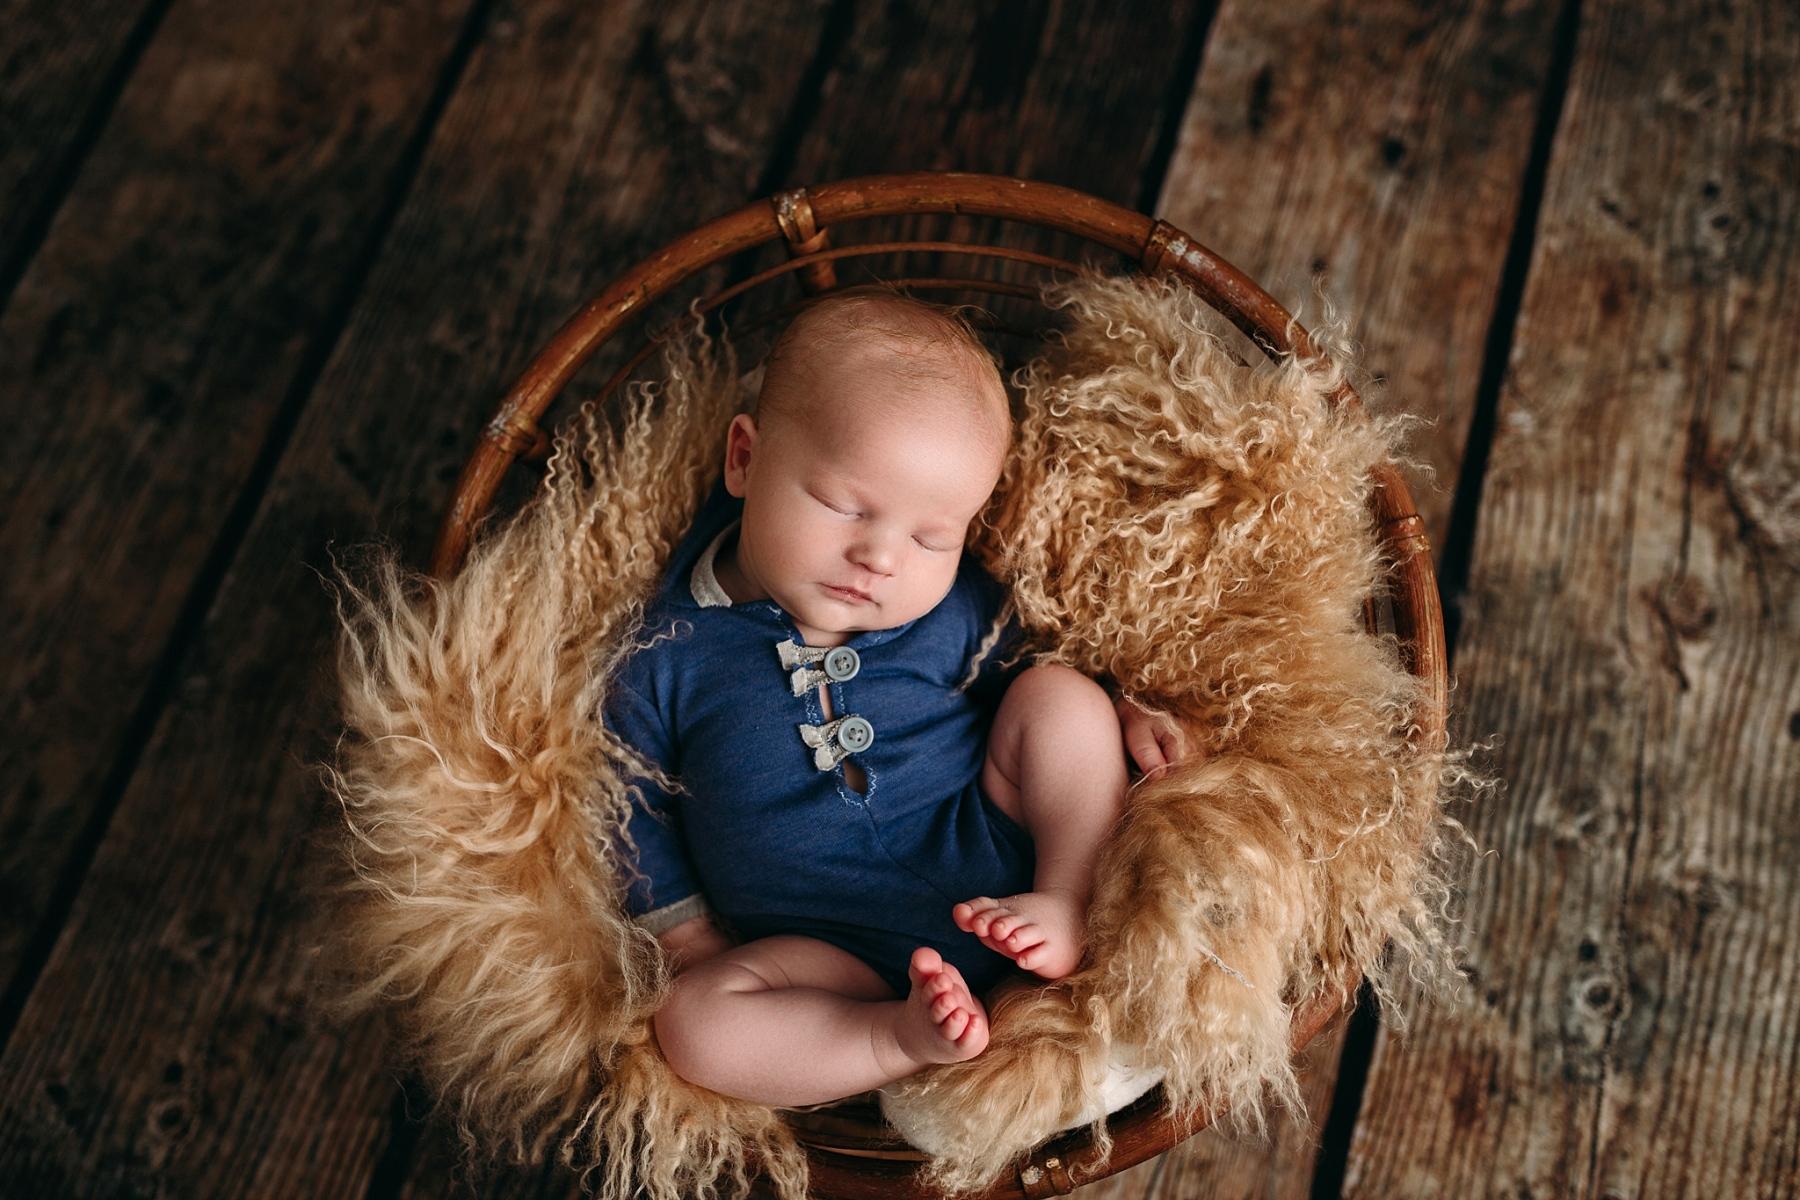 newborn boy posed on brown fur bowl in newborn photography studio